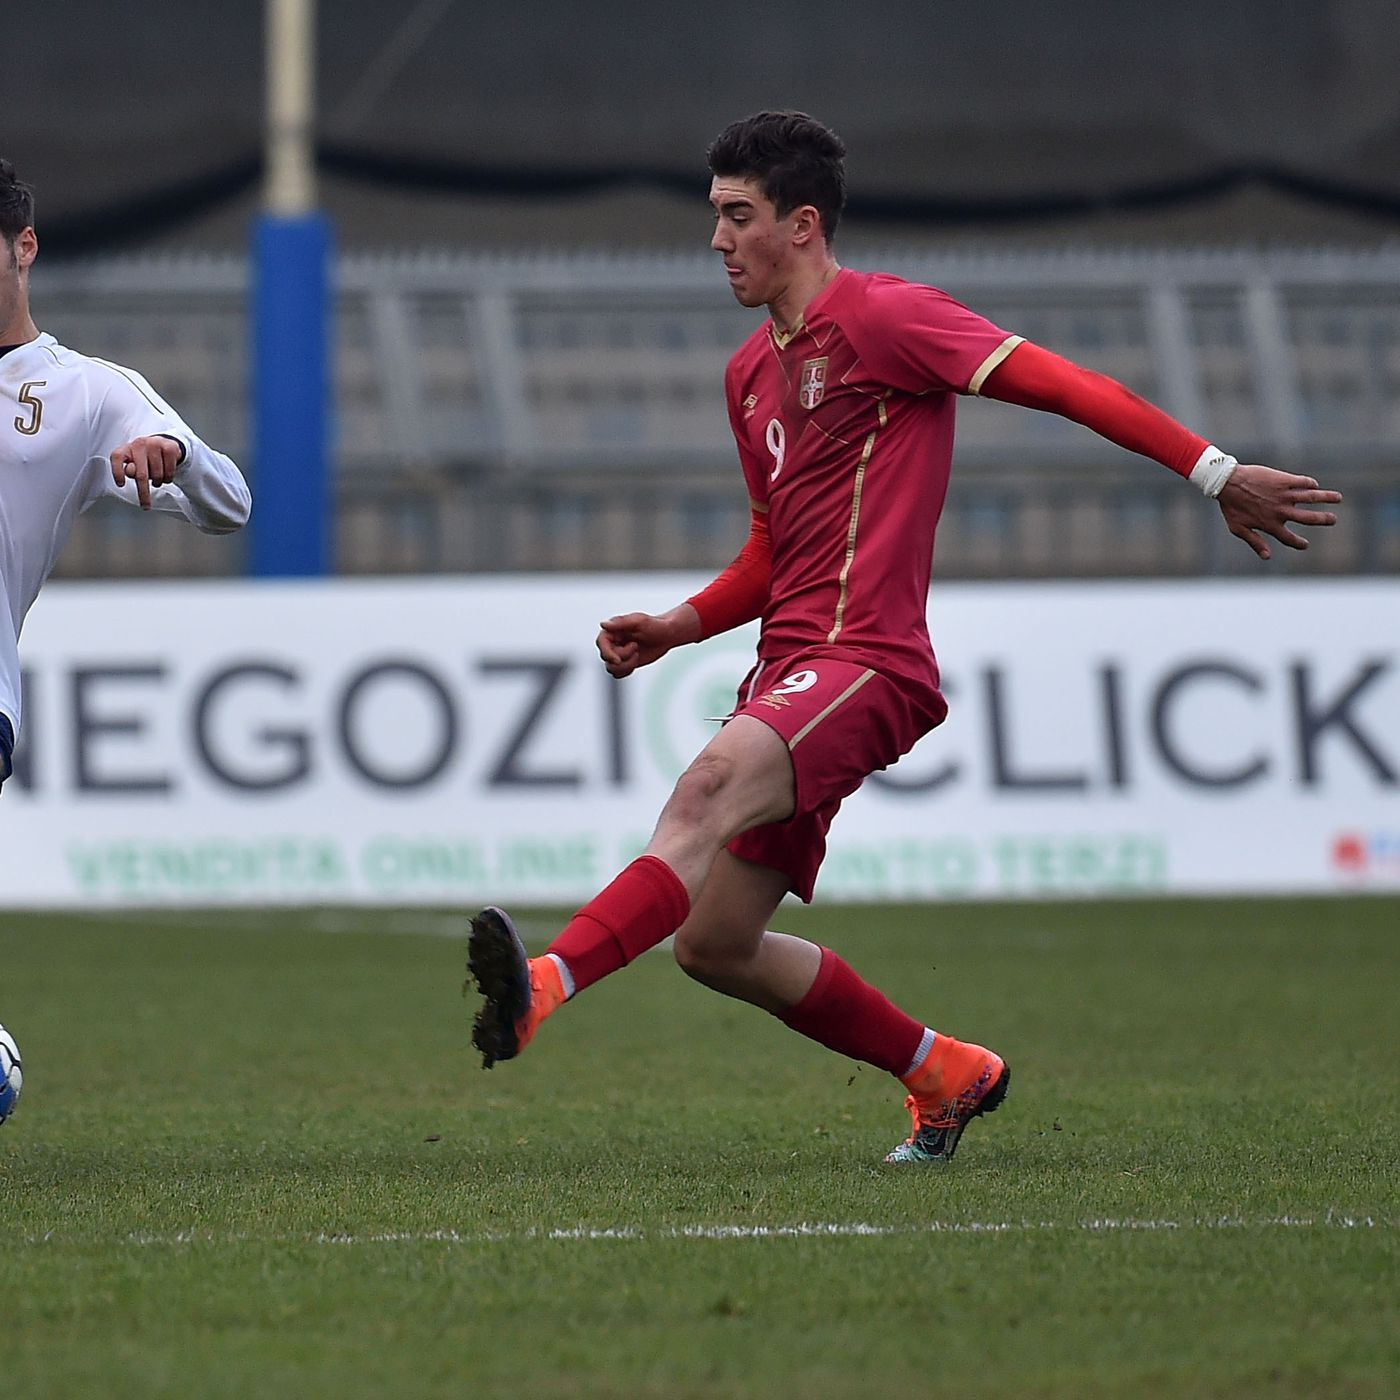 OFFICIAL: Fiorentina sign Dušan Vlahović - Viola Nation